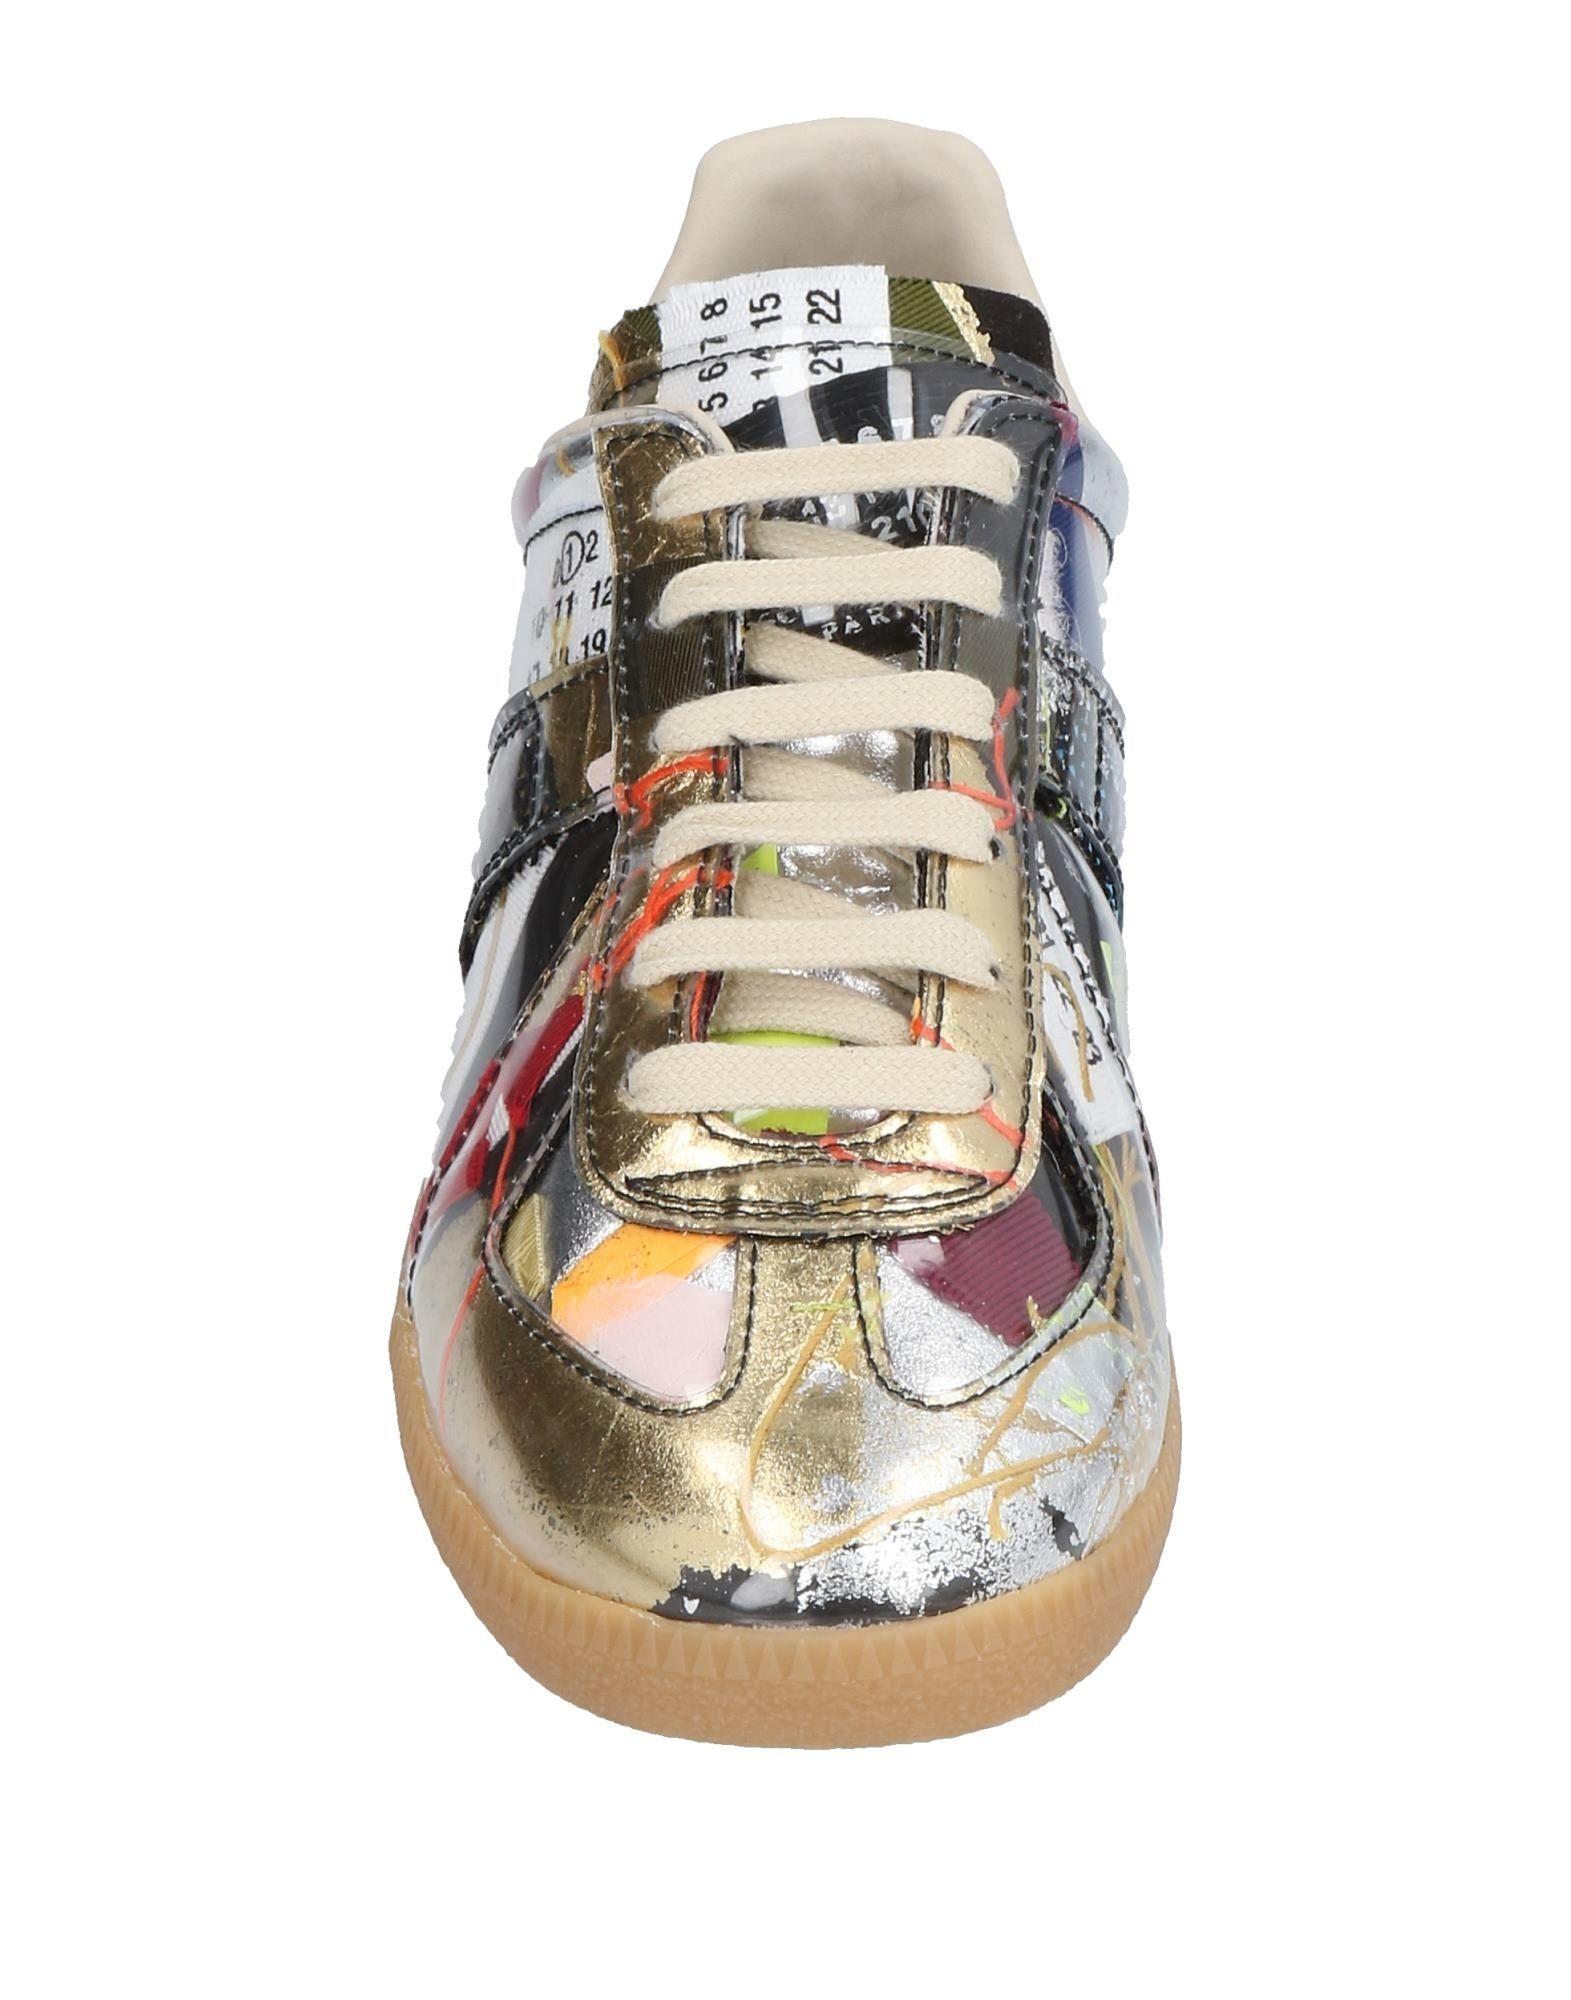 Maison 11471870TQ Margiela Sneakers Damen  11471870TQ Maison Neue Schuhe a6d8d0